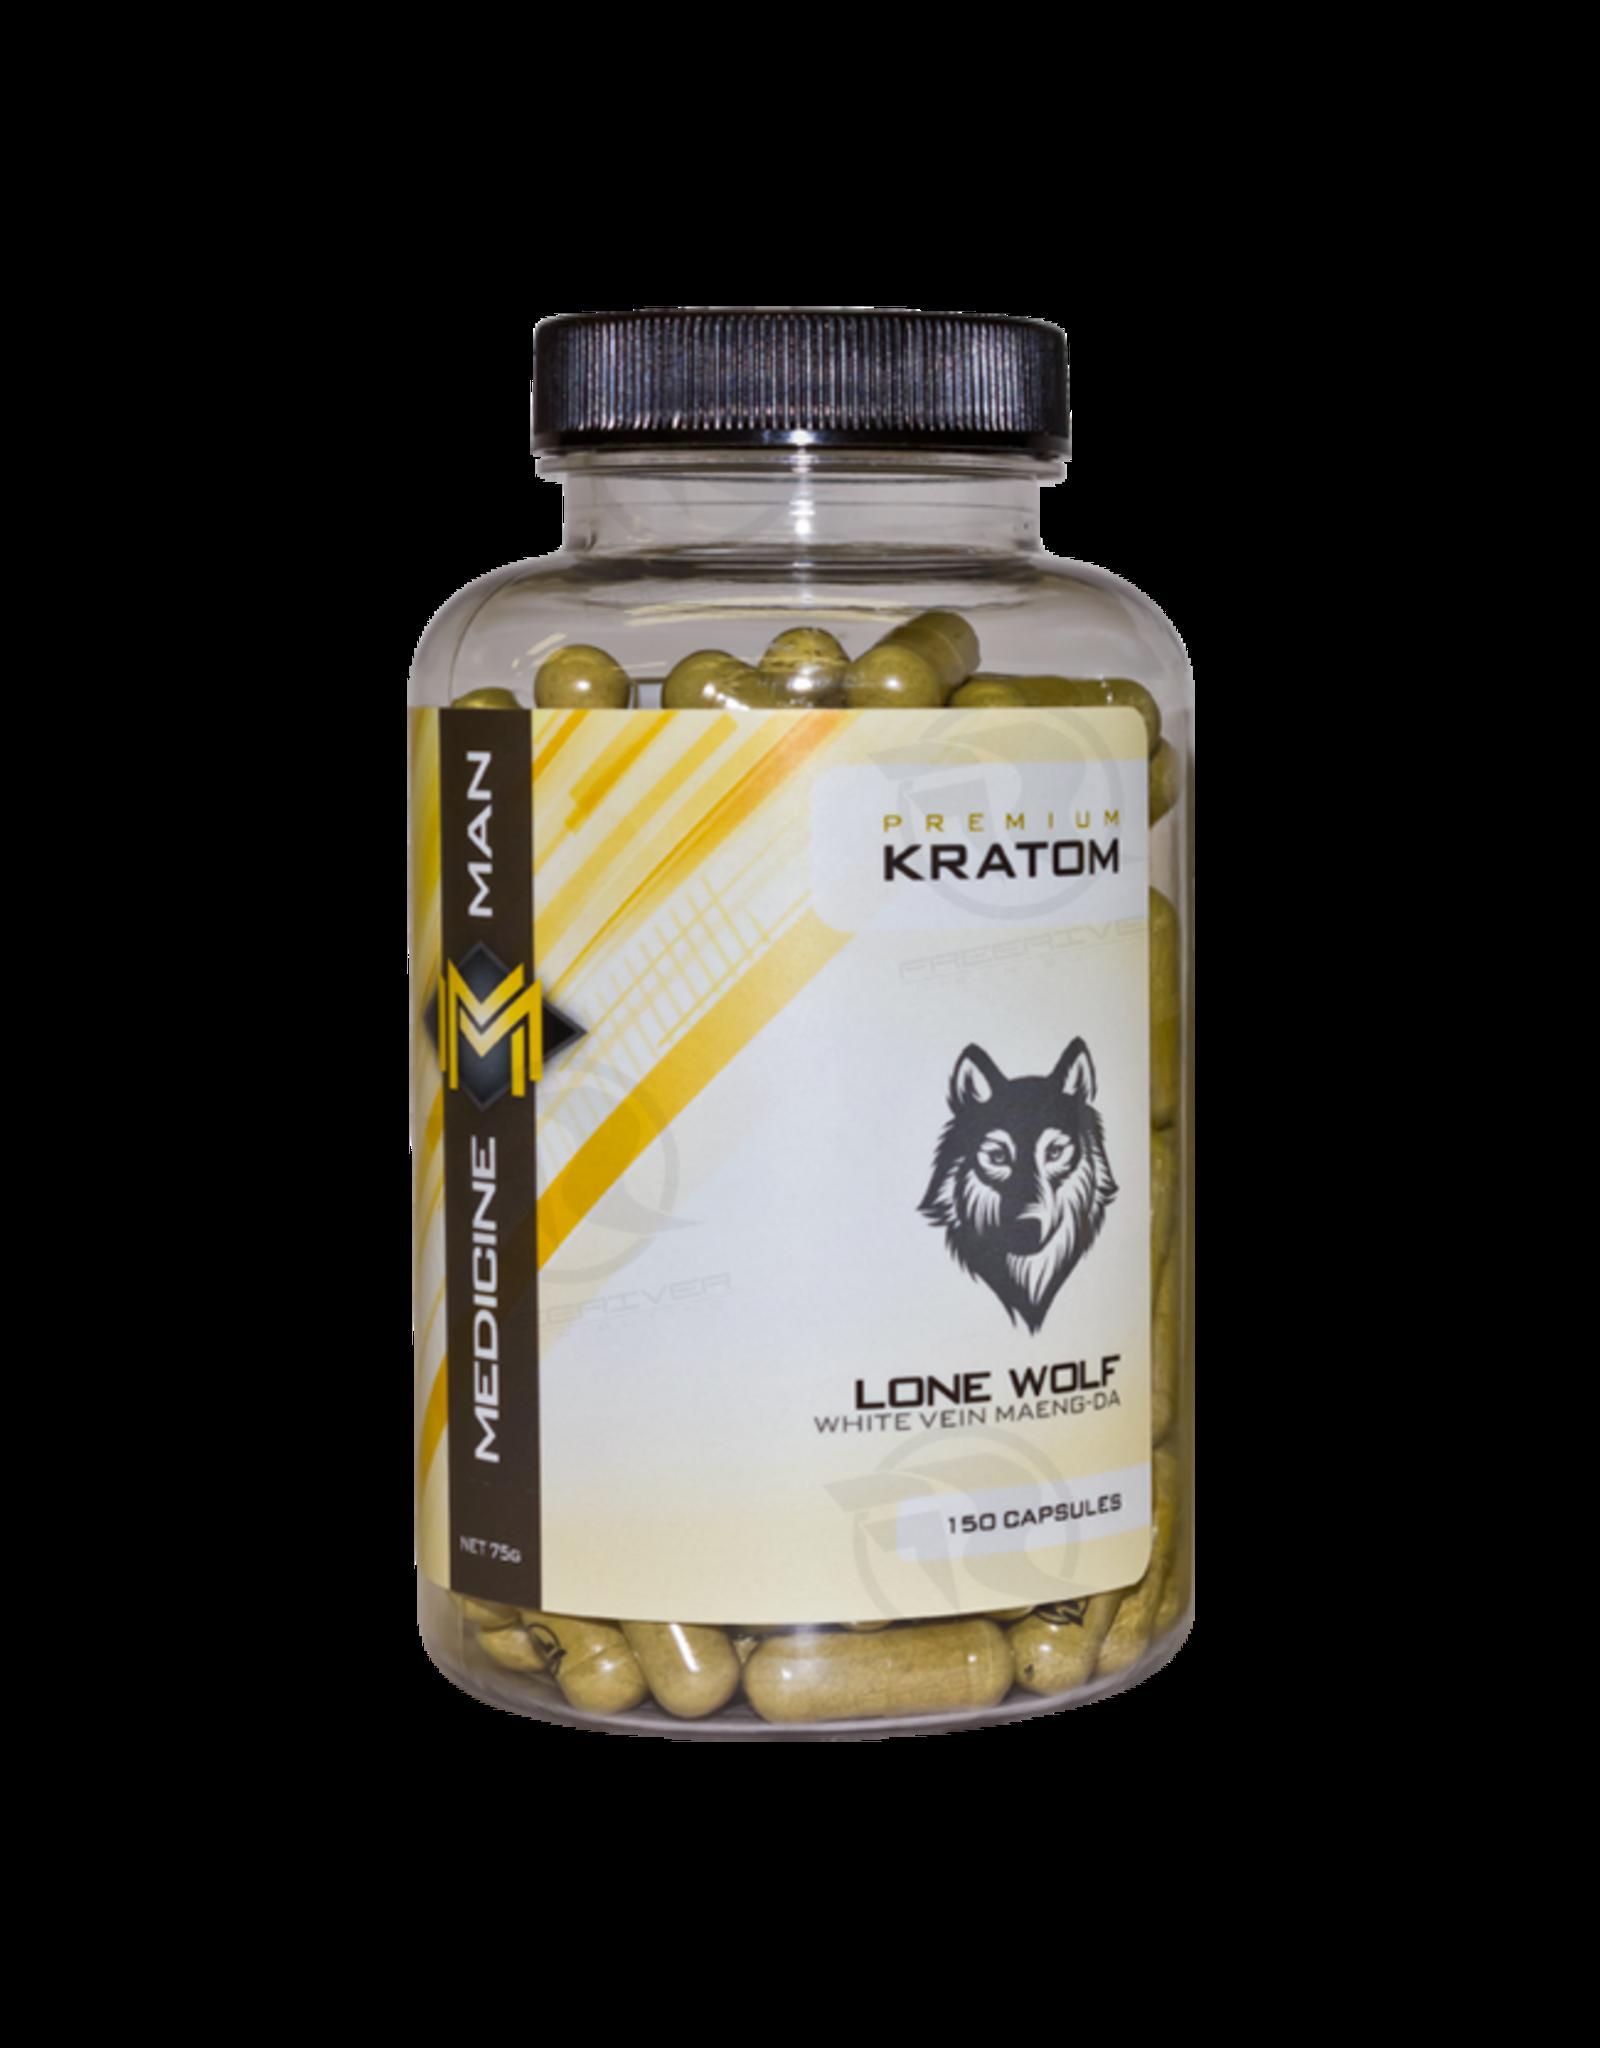 Medicine Man Kratom Lone Wolf 150 Caps 6pk